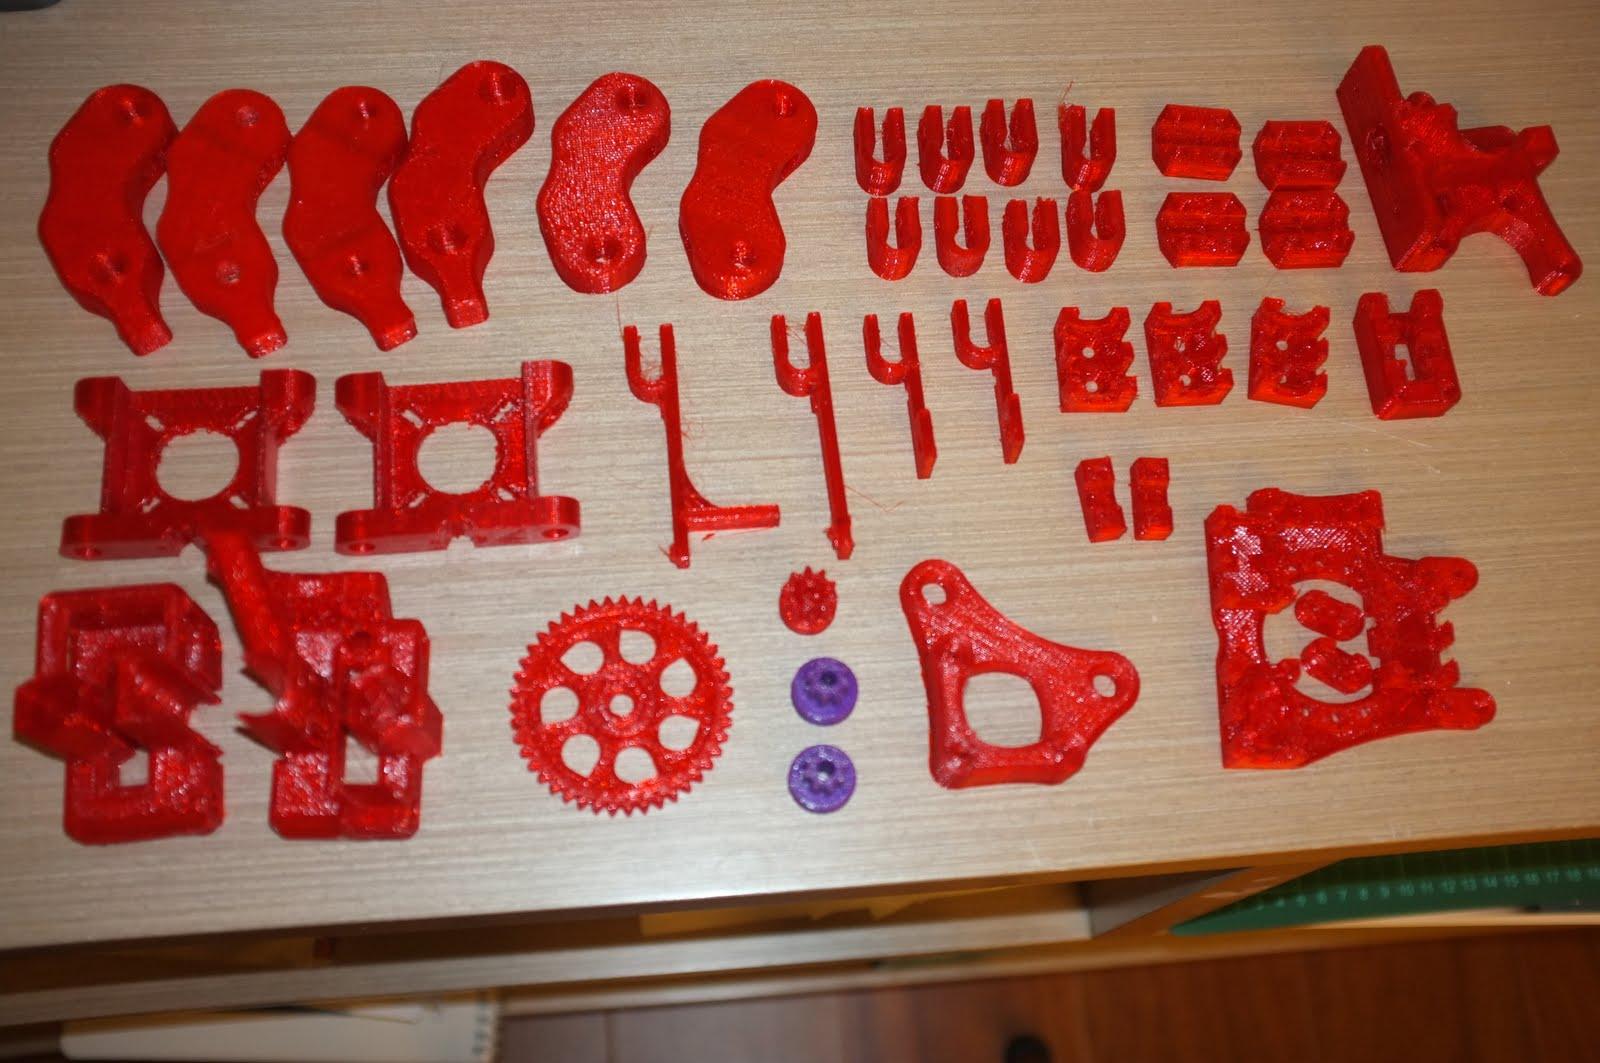 Http Http Http 000vmm S3 Amazonaws Com Printrbot Files 2011 08 Printinggold Jpg Http 000vmm S3 Amazonaws Com Printrbot Files 2011 11 Tall Print 2 1 Jpg Http 0o2471 Net 28303 Http 127 0 0 1 Awesome Http 128 205 126 49 600m Gps Html Http